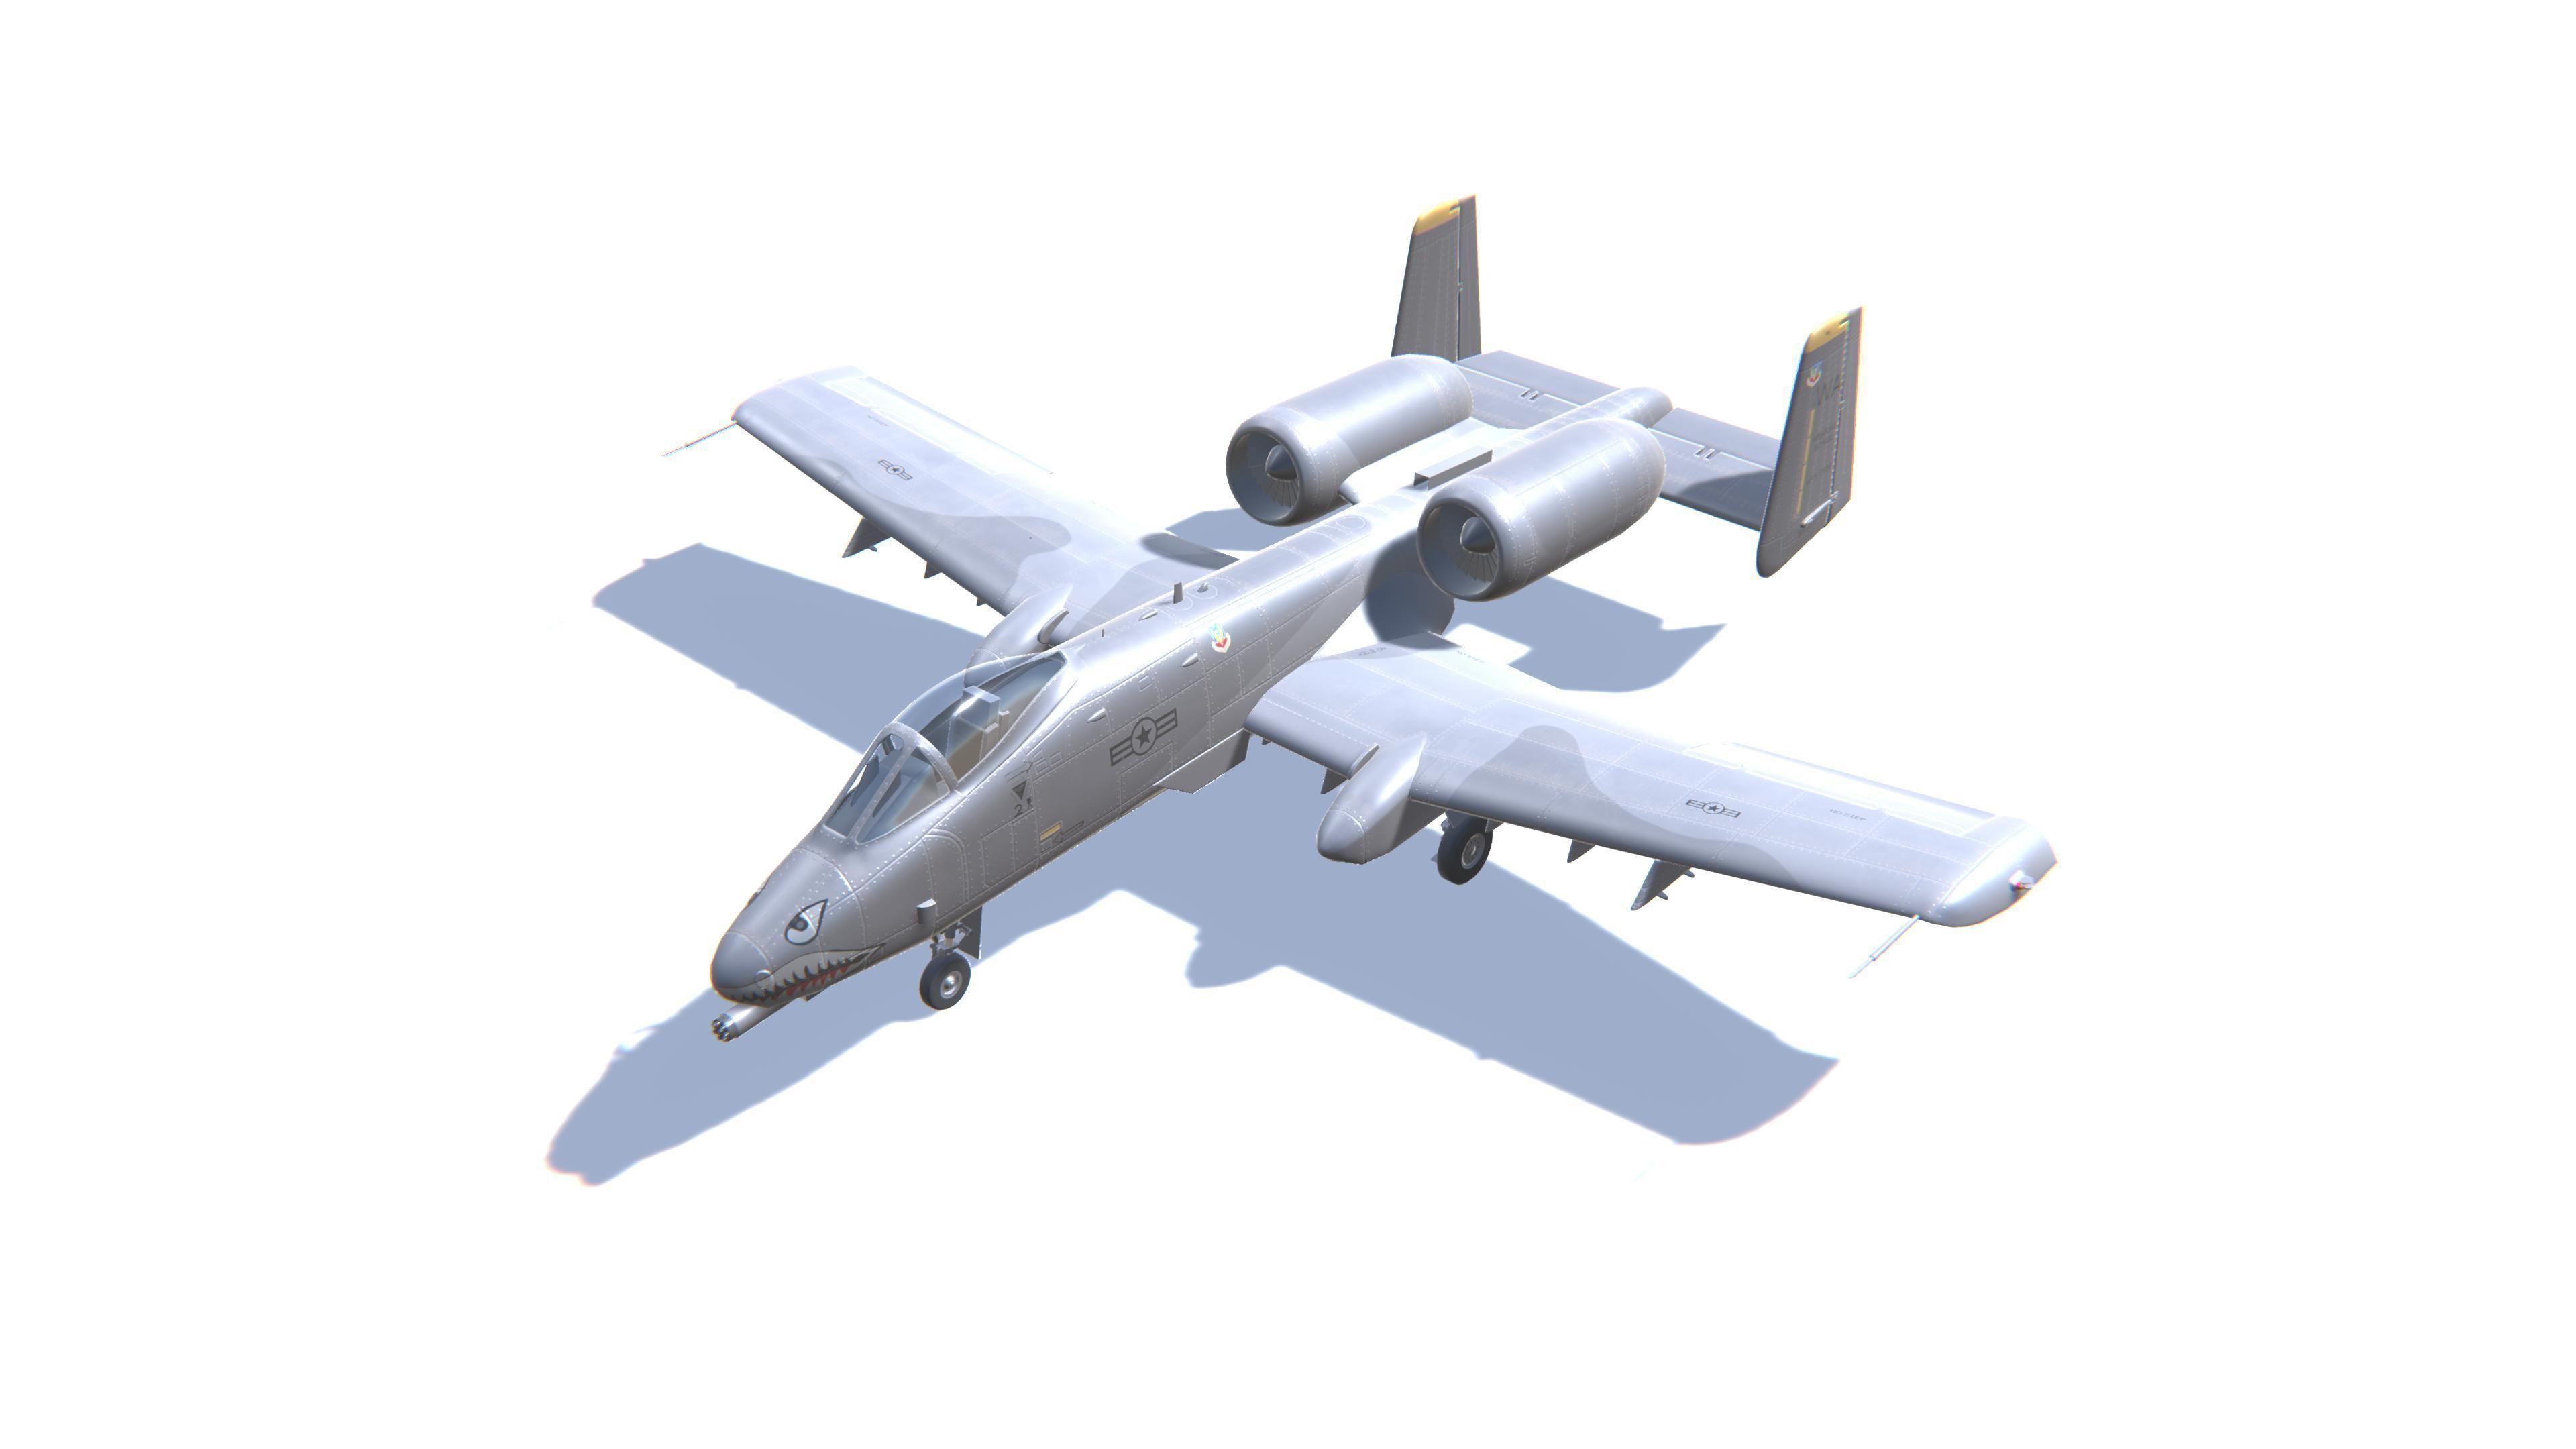 A-10 Thunderbolt Jet Fighter Aircraft